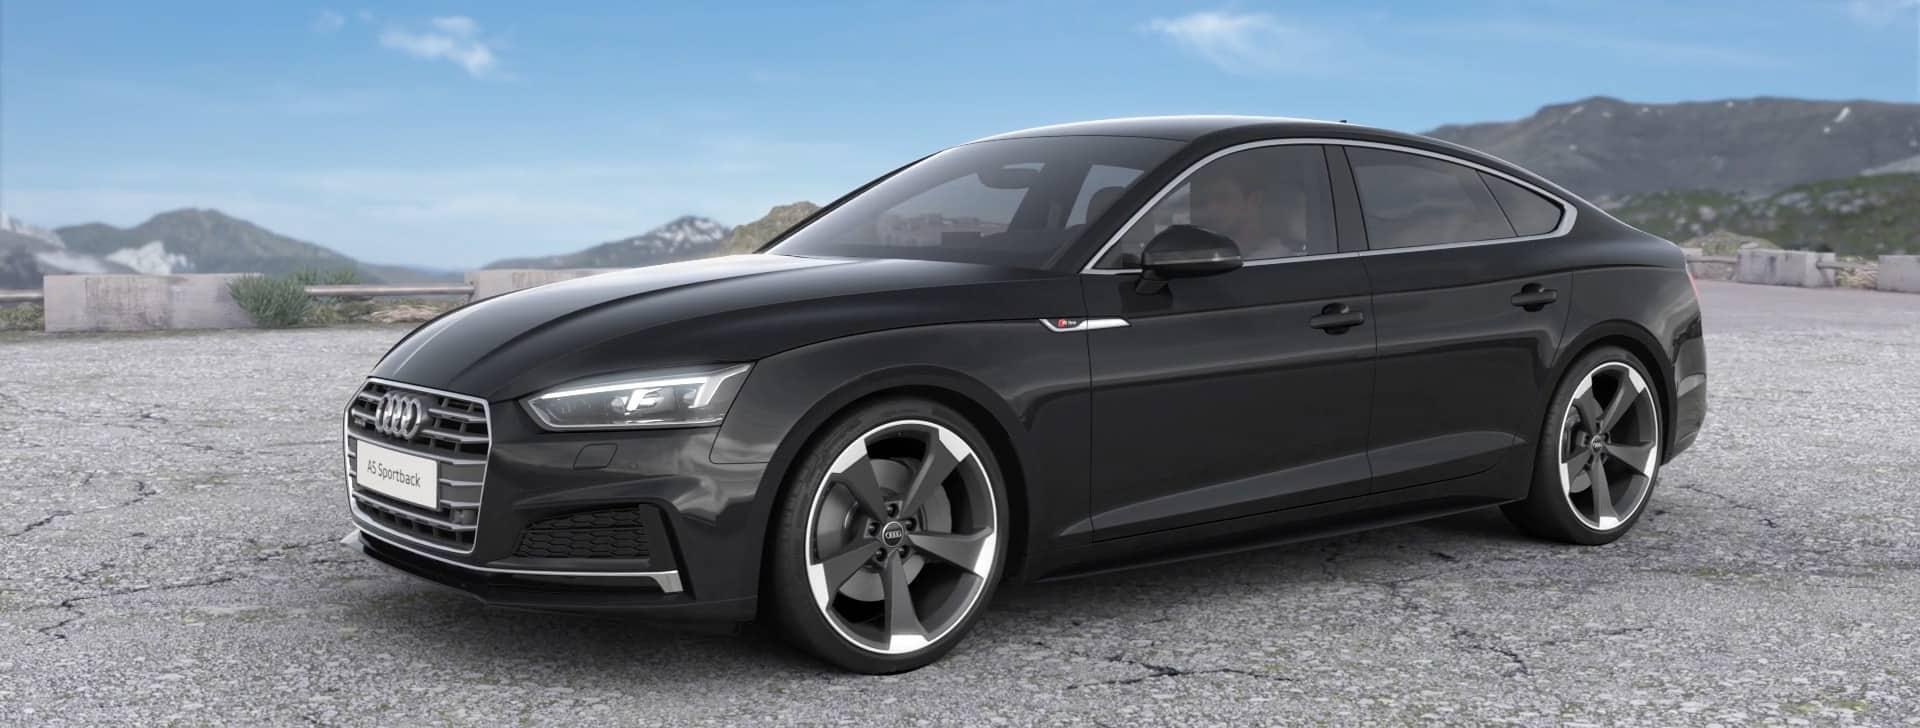 Audi A Sportback A Audi Middle East - Audi a5 sportback